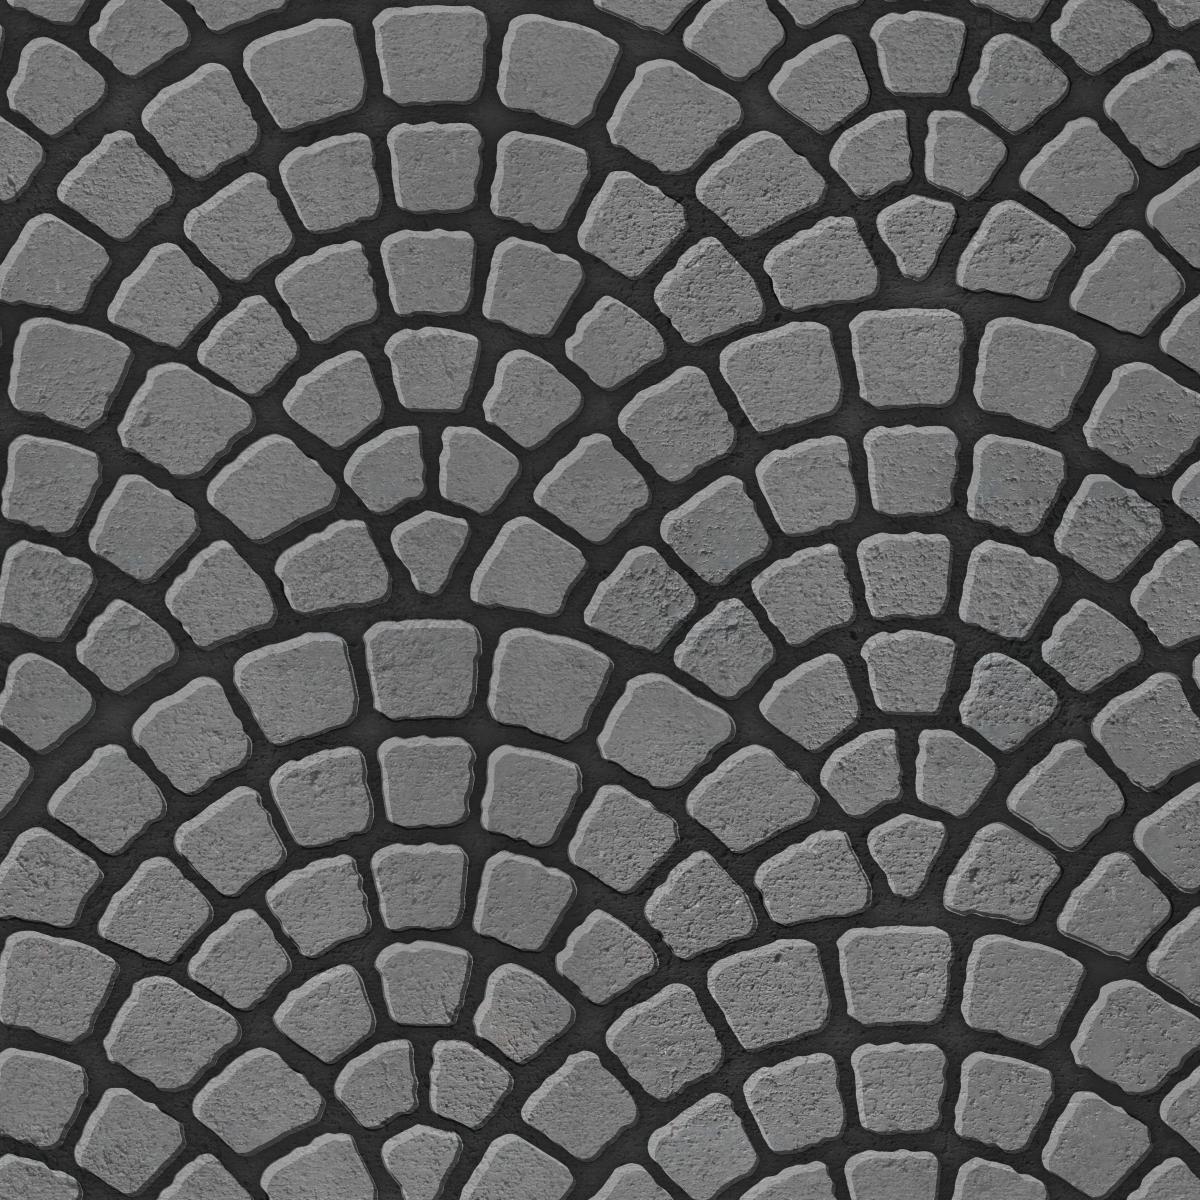 Scallop paving pattern